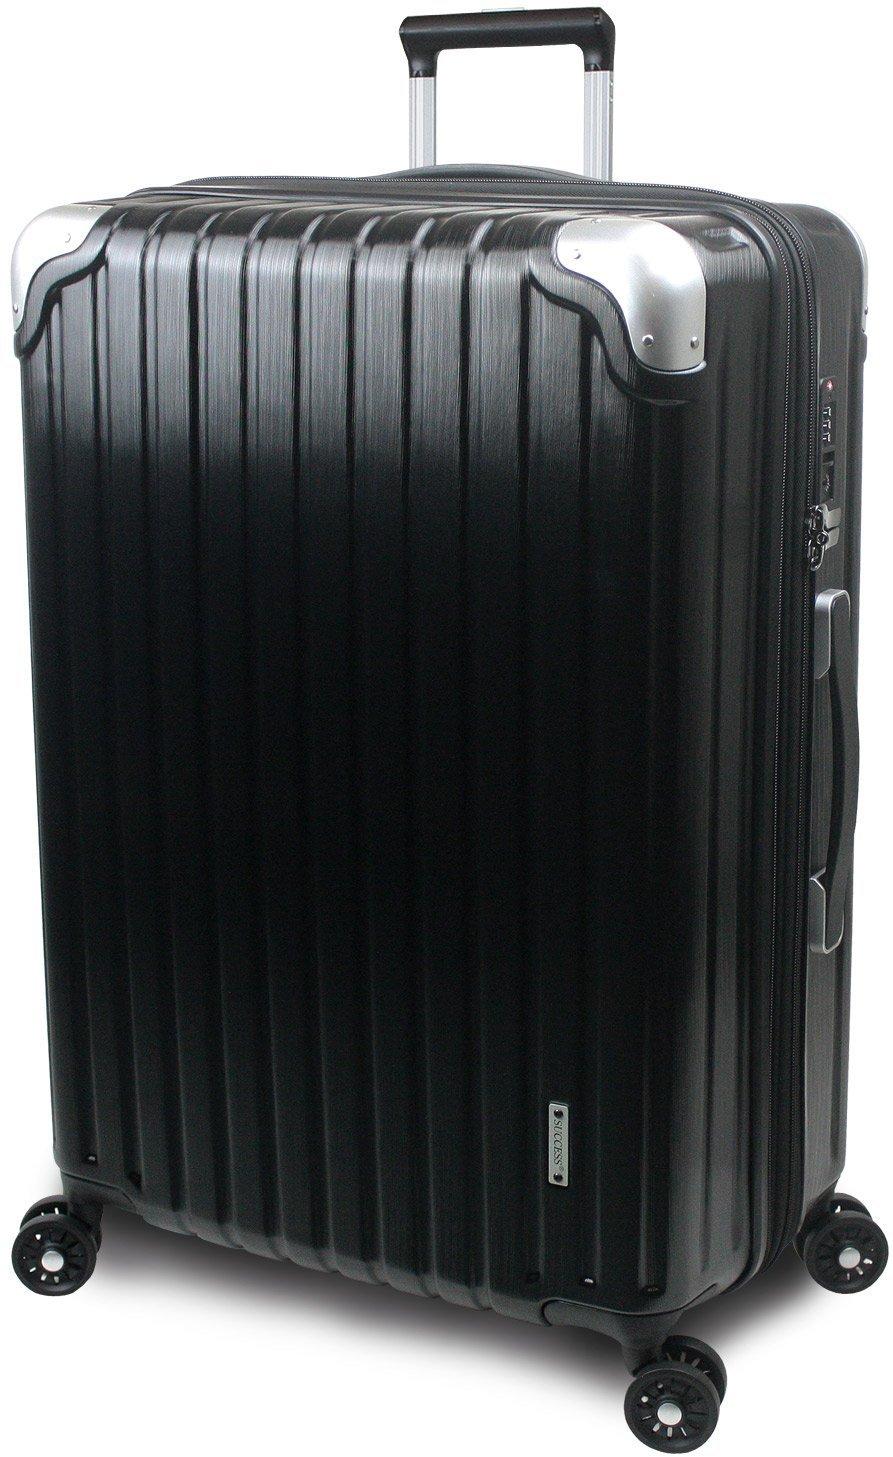 【SUCCESS サクセス】 スーツケース 3サイズ 【 大型 76cm/ジャスト型 70cm/中型 65cm 】 超軽量 TSAロック搭載 【 プロデンス コーナーパットモデル】 B01ELOM2V0 中型 Mサイズ 65cm ブラックヘアライン ブラックヘアライン 中型 Mサイズ 65cm